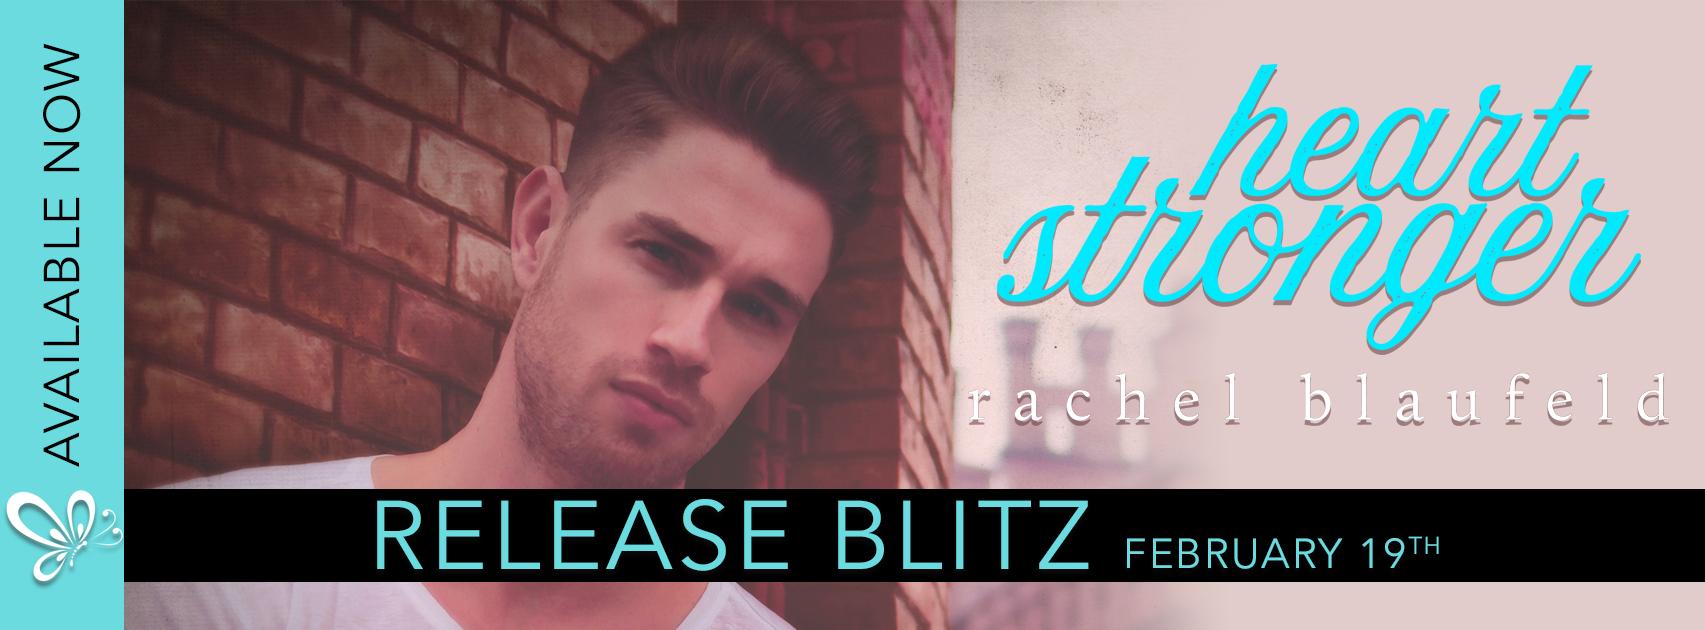 Release Blitz:  Heart Stronger by Rachel Blaufeld